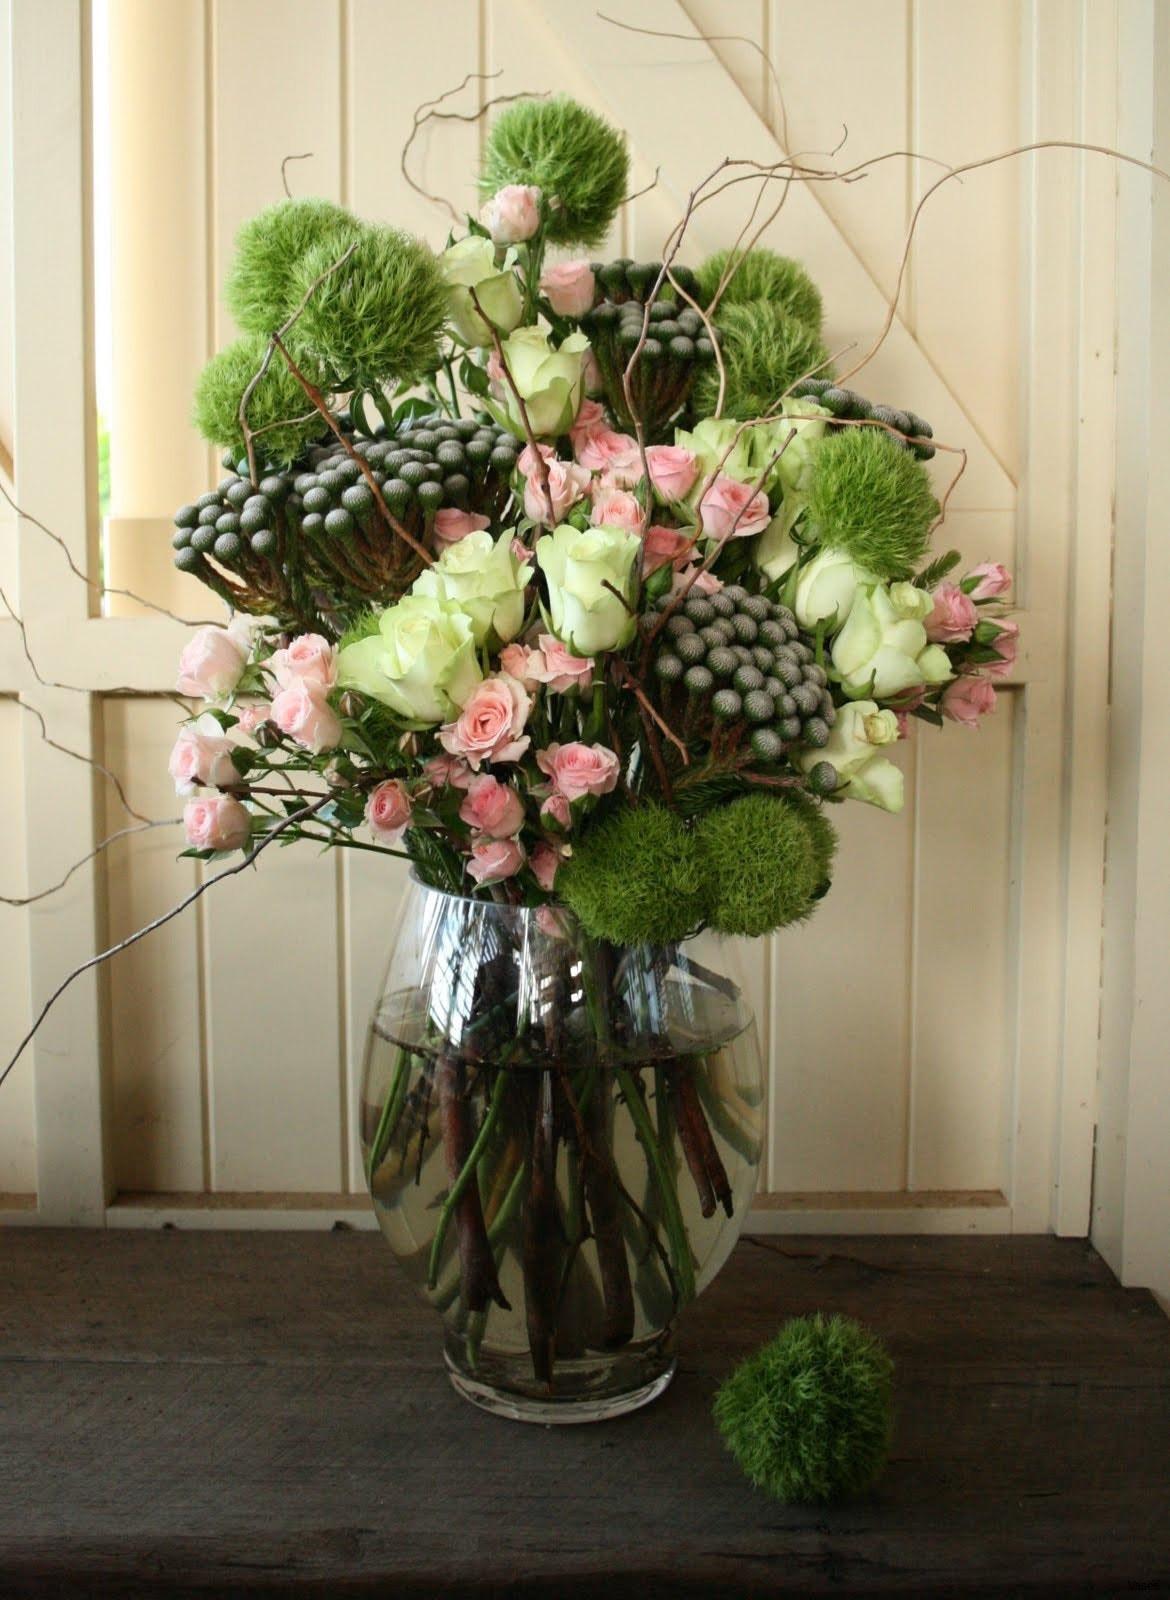 Japanese Ikebana Vases Of Floral Arrangement Inspiration Page 20 Inspiration for Your In Bouquets Flowers Weddings H Vases Vase Flower Arrangements I 0d Design Ideas Wild Flower Arrangement